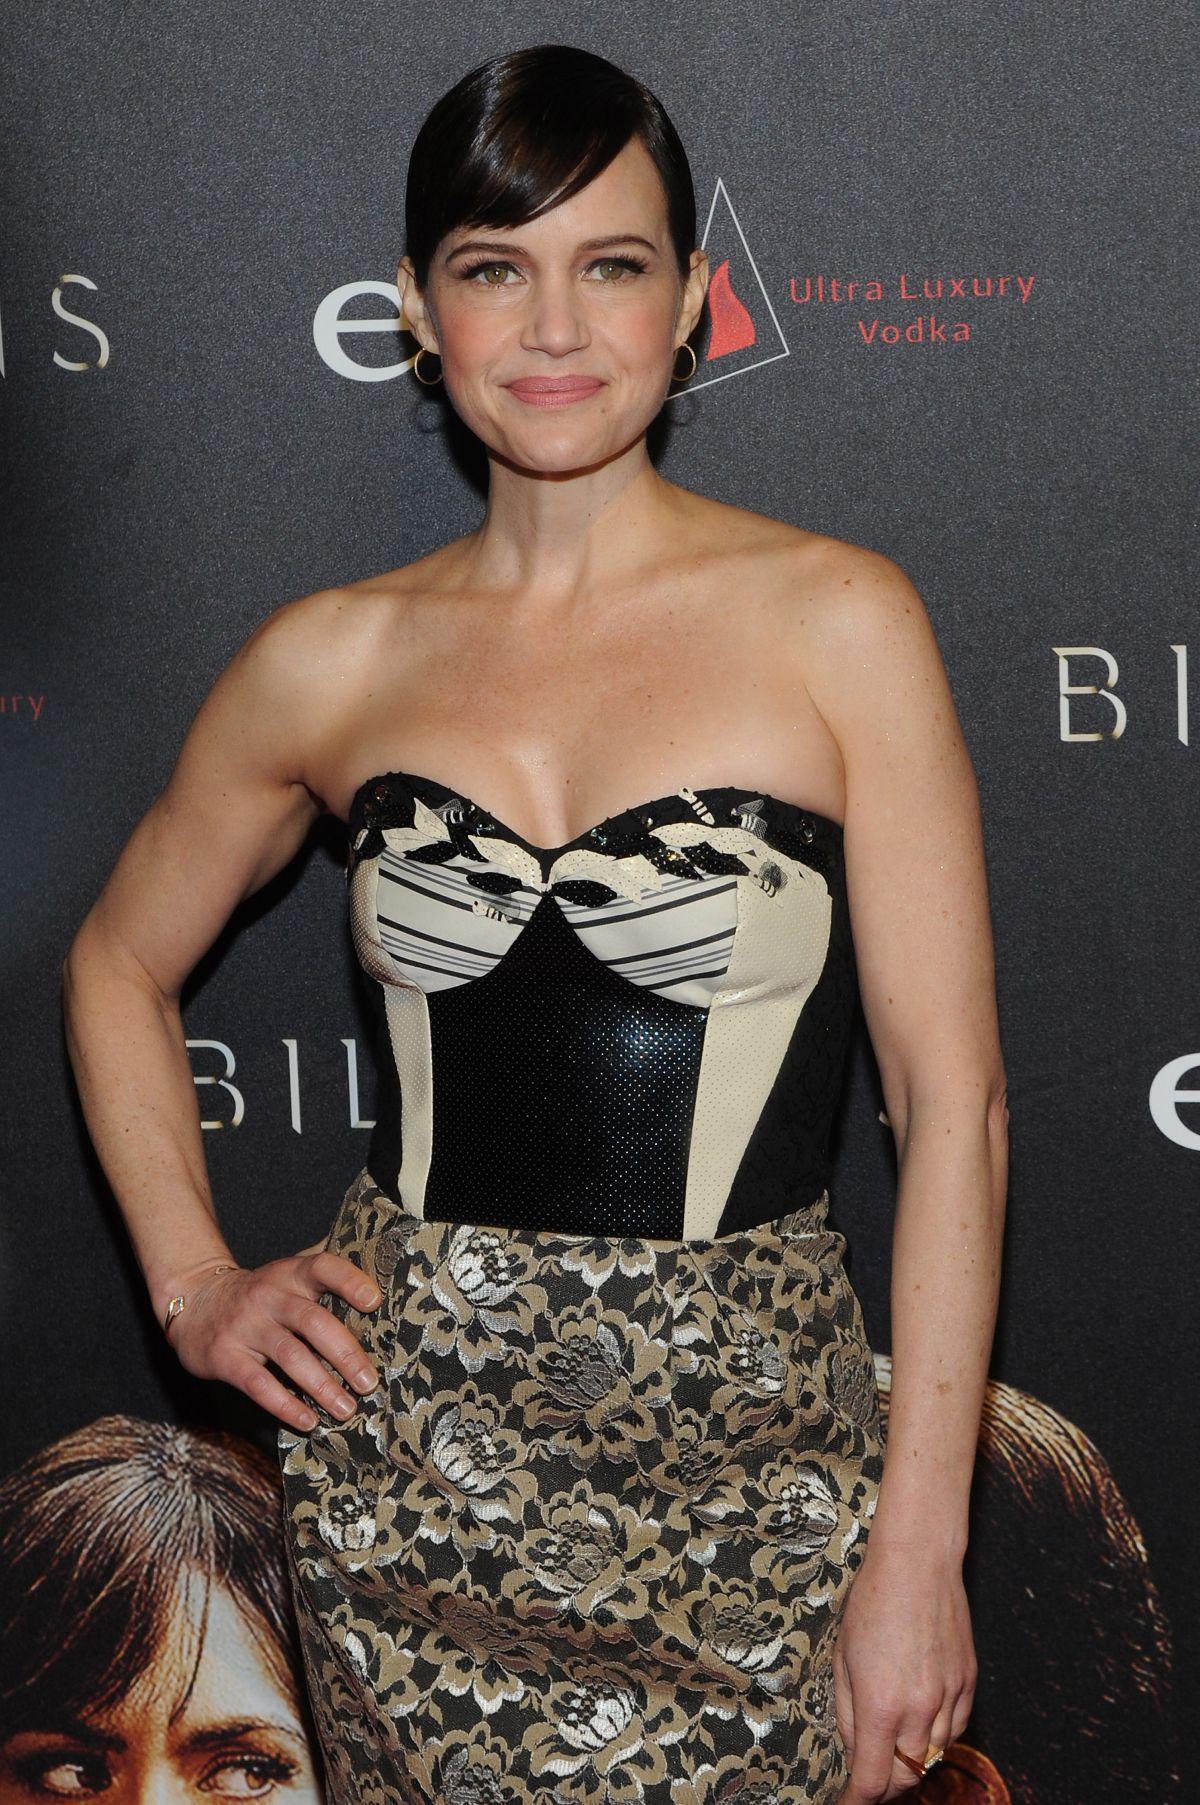 CARLA GUGINO at 'Billions' Season 2 Premiere in New York 02/13/2017